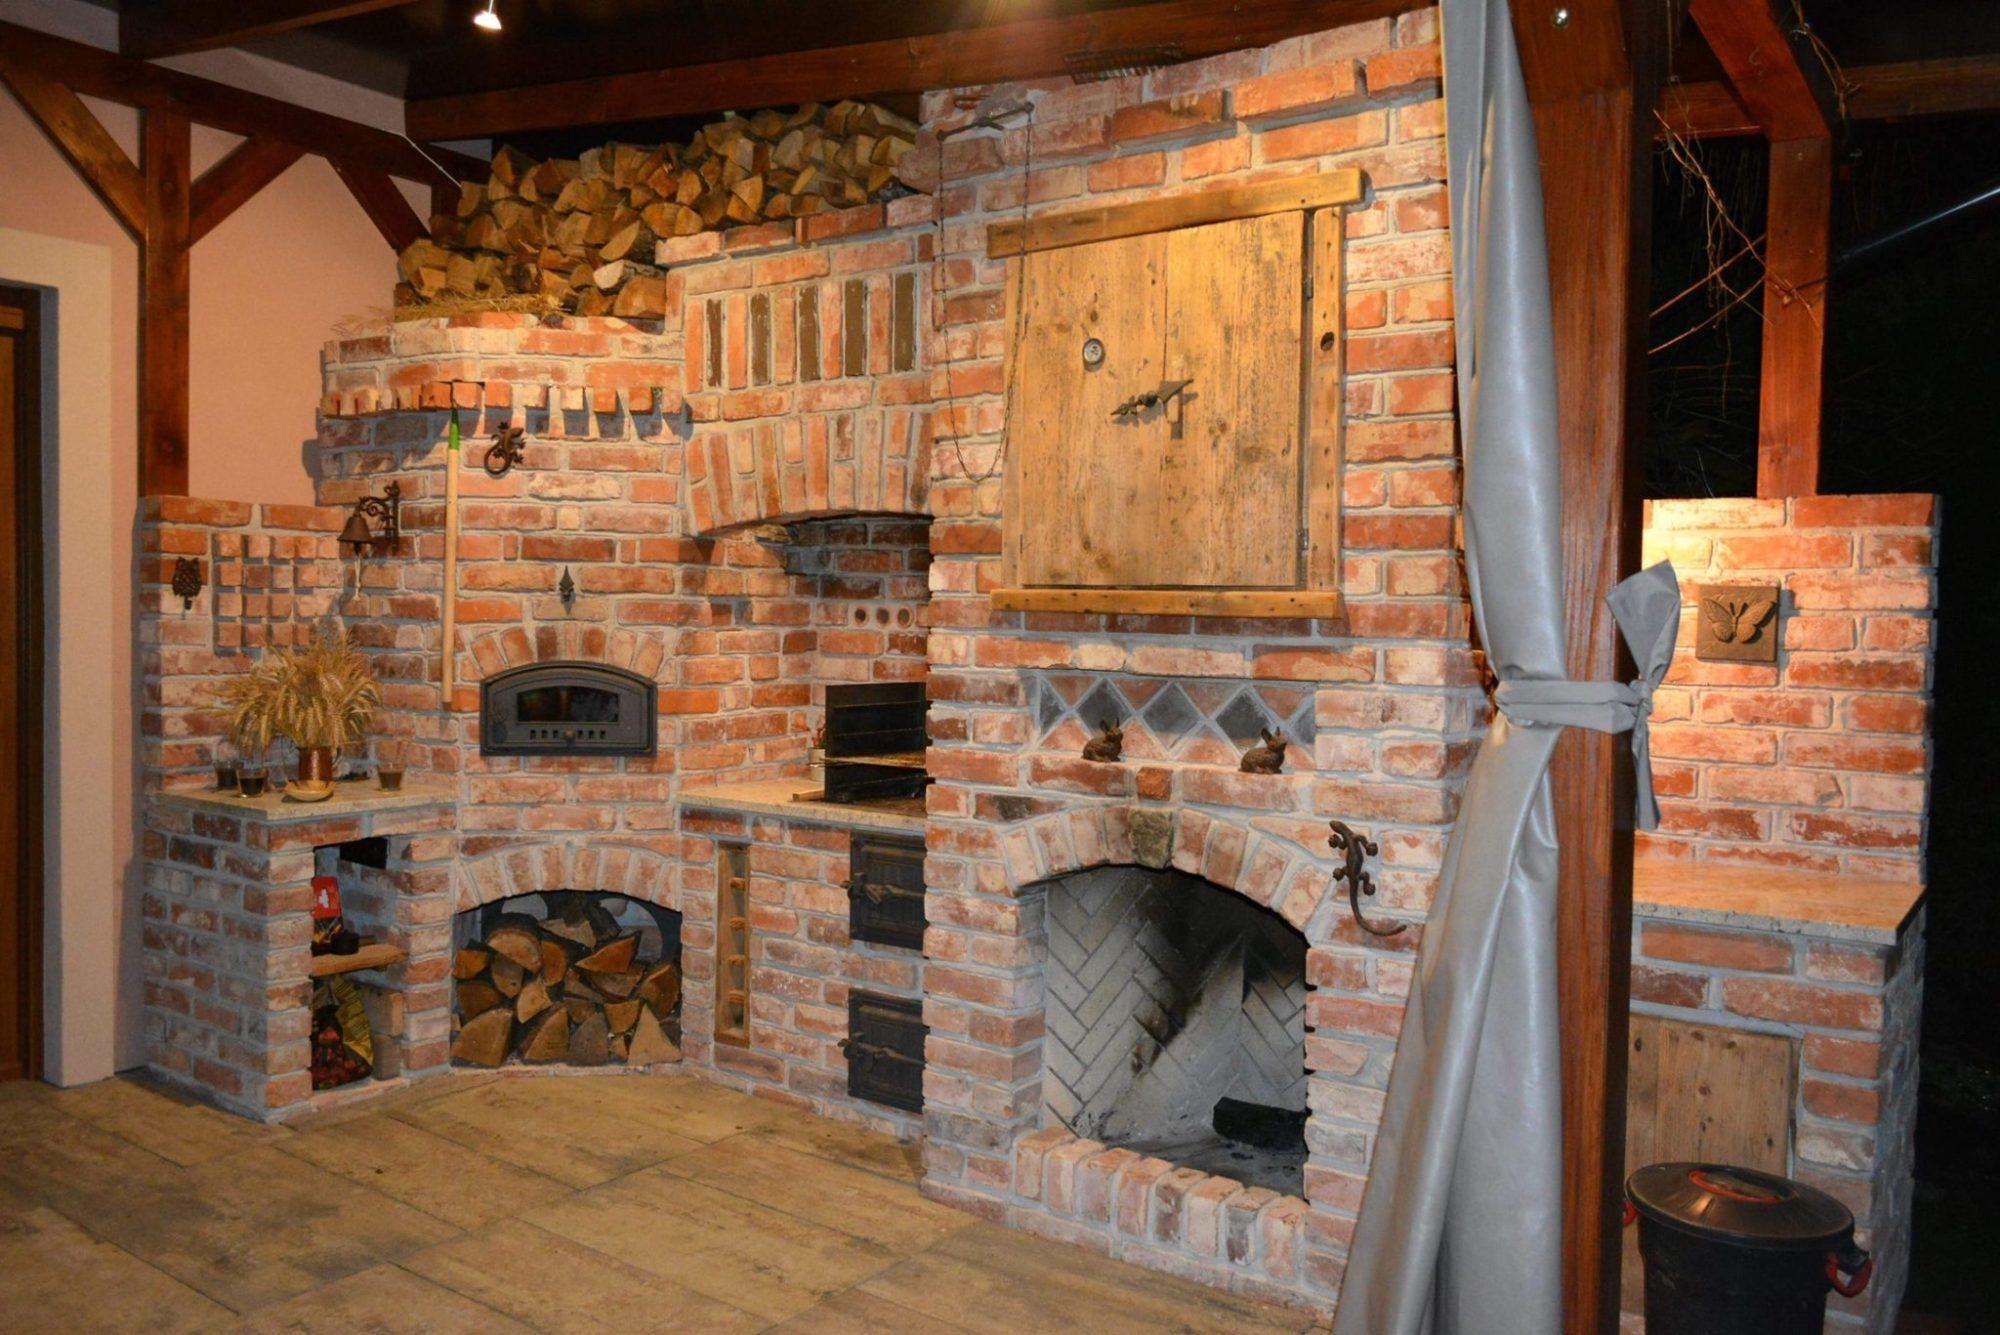 Kuchnie Ze Starej Cegly Kuchnie Letnie Ogrody Zimowe Grille Piece Kuchnia W Ogrodzie Sauna Diy Outdoor Cooking Outdoor Cooking Area